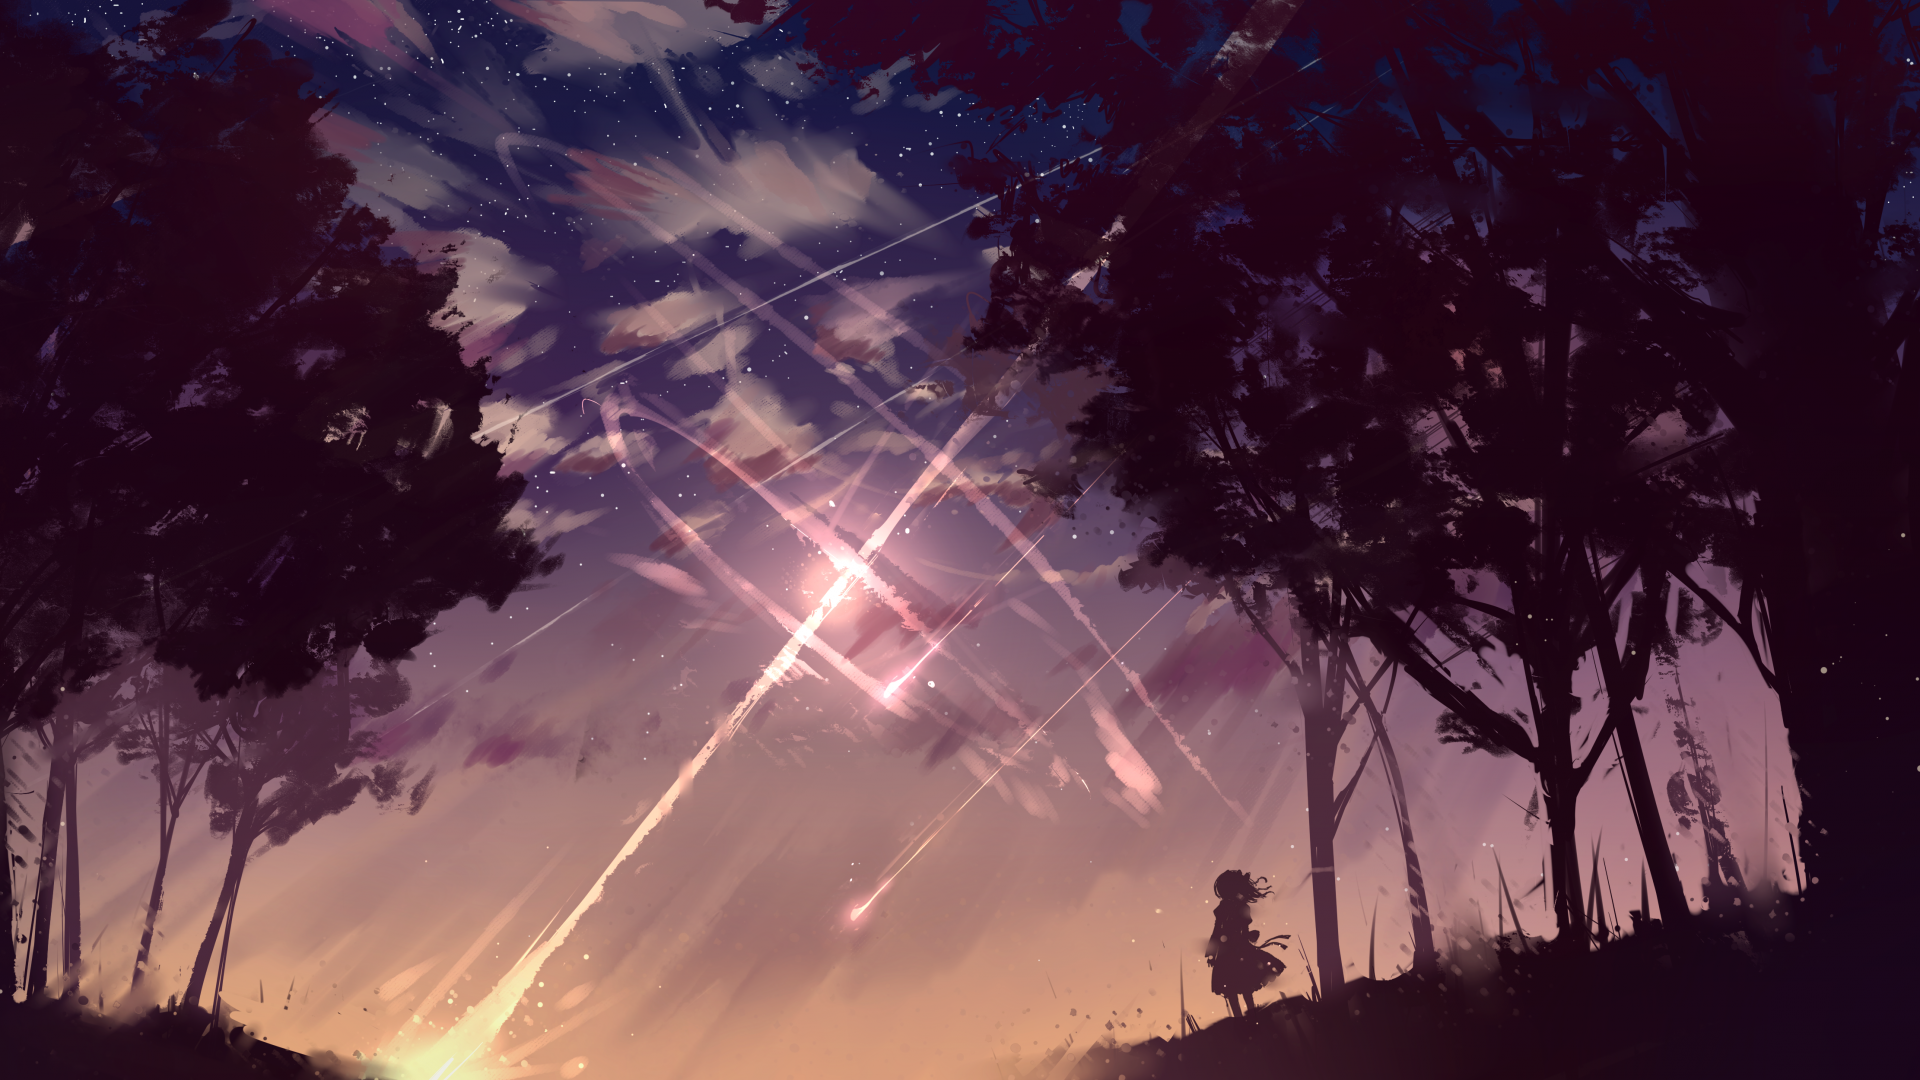 Anime 1920x1080 digital art digital landscape fantasy art forest